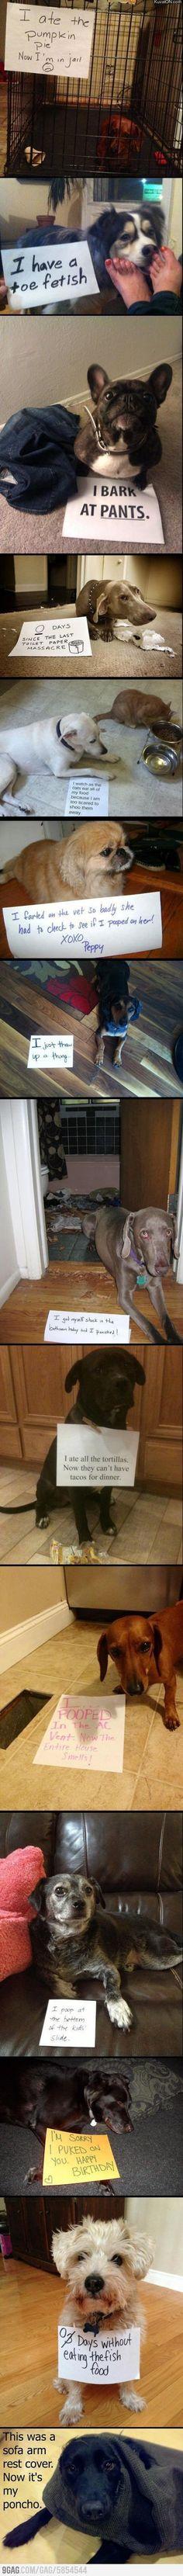 Best of dog shaming